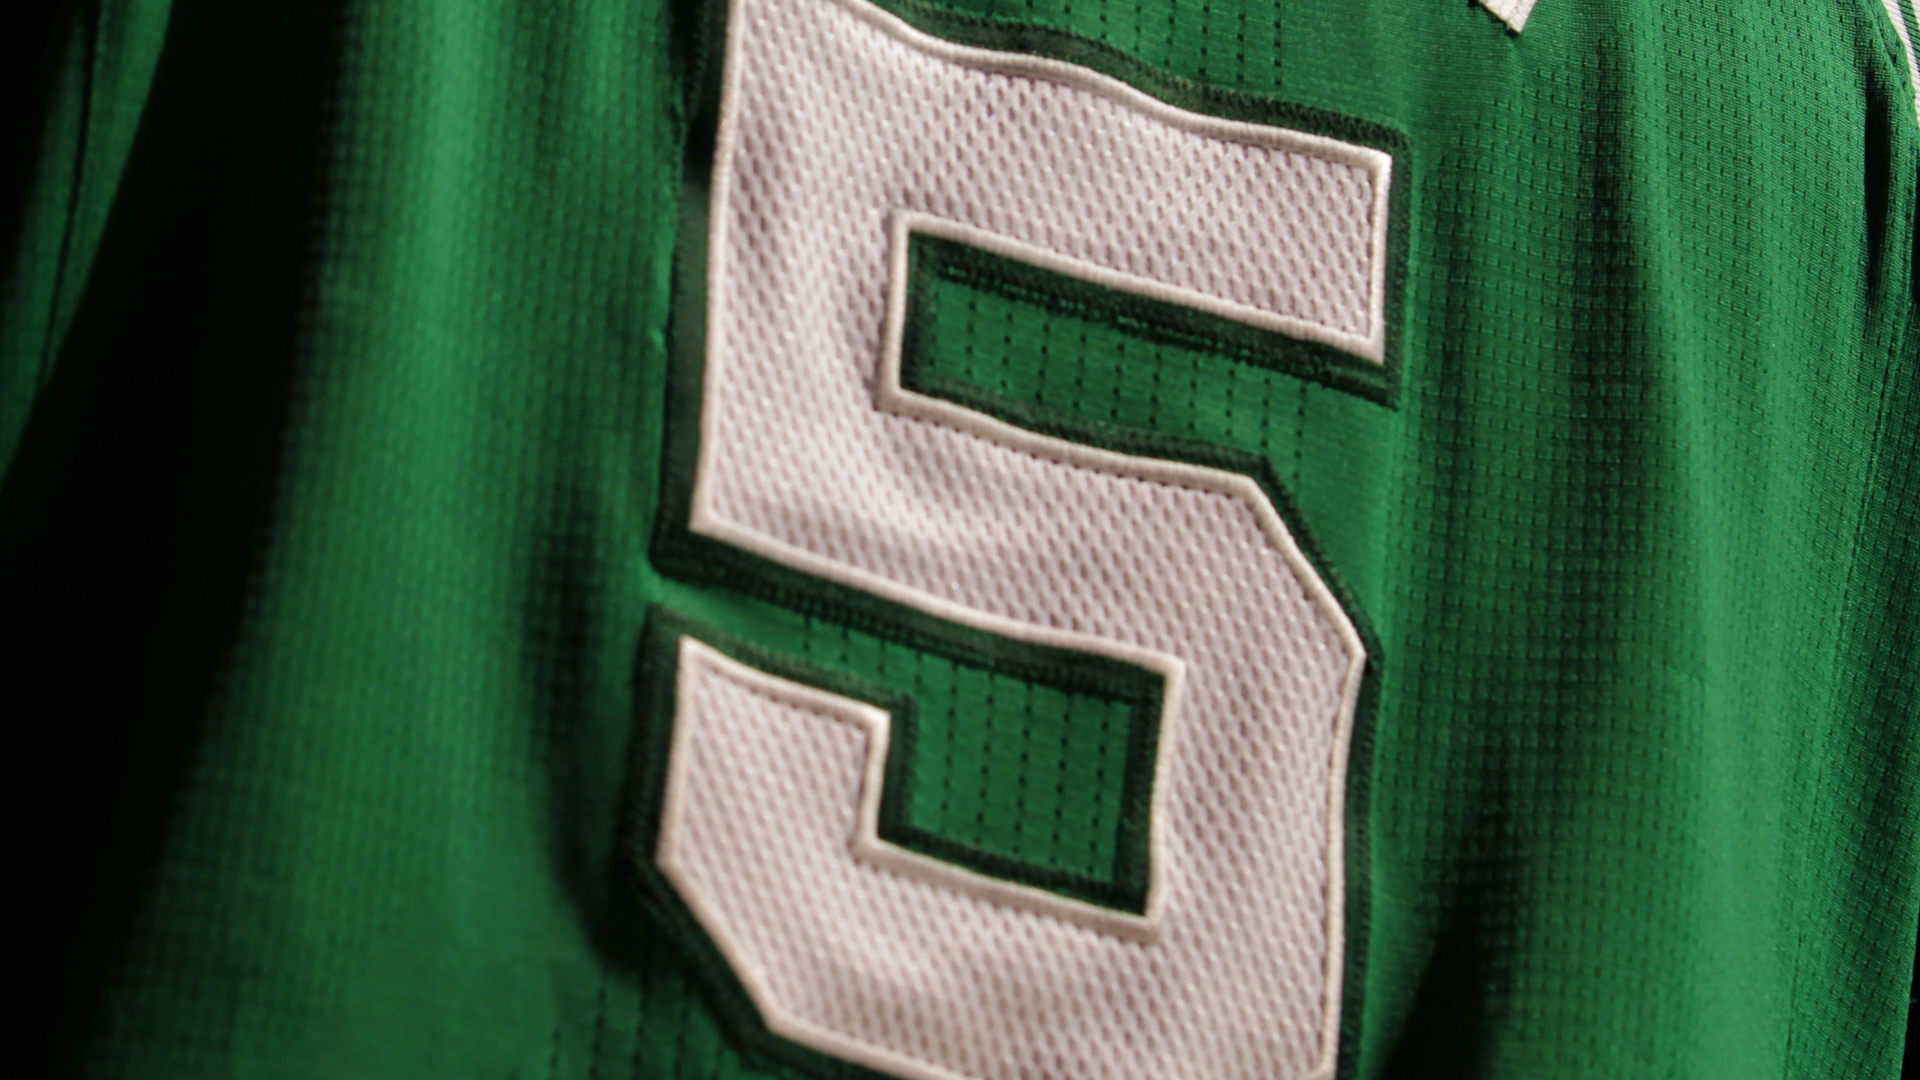 Celtics announce plans to retire Kevin Garnett's No. 5 jersey